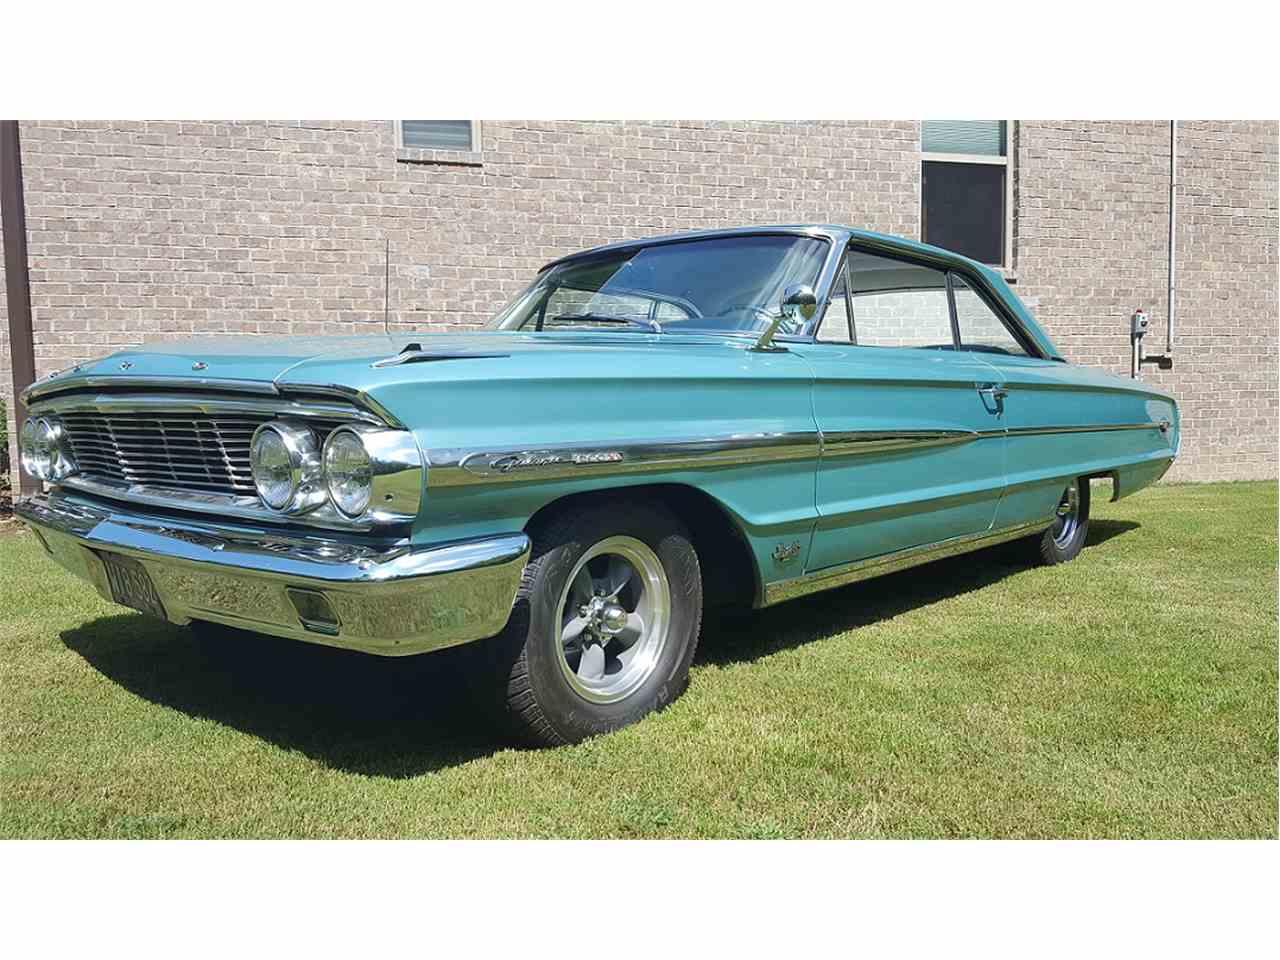 1964 Ford Galaxie 500 XL for Sale - CC-1002805